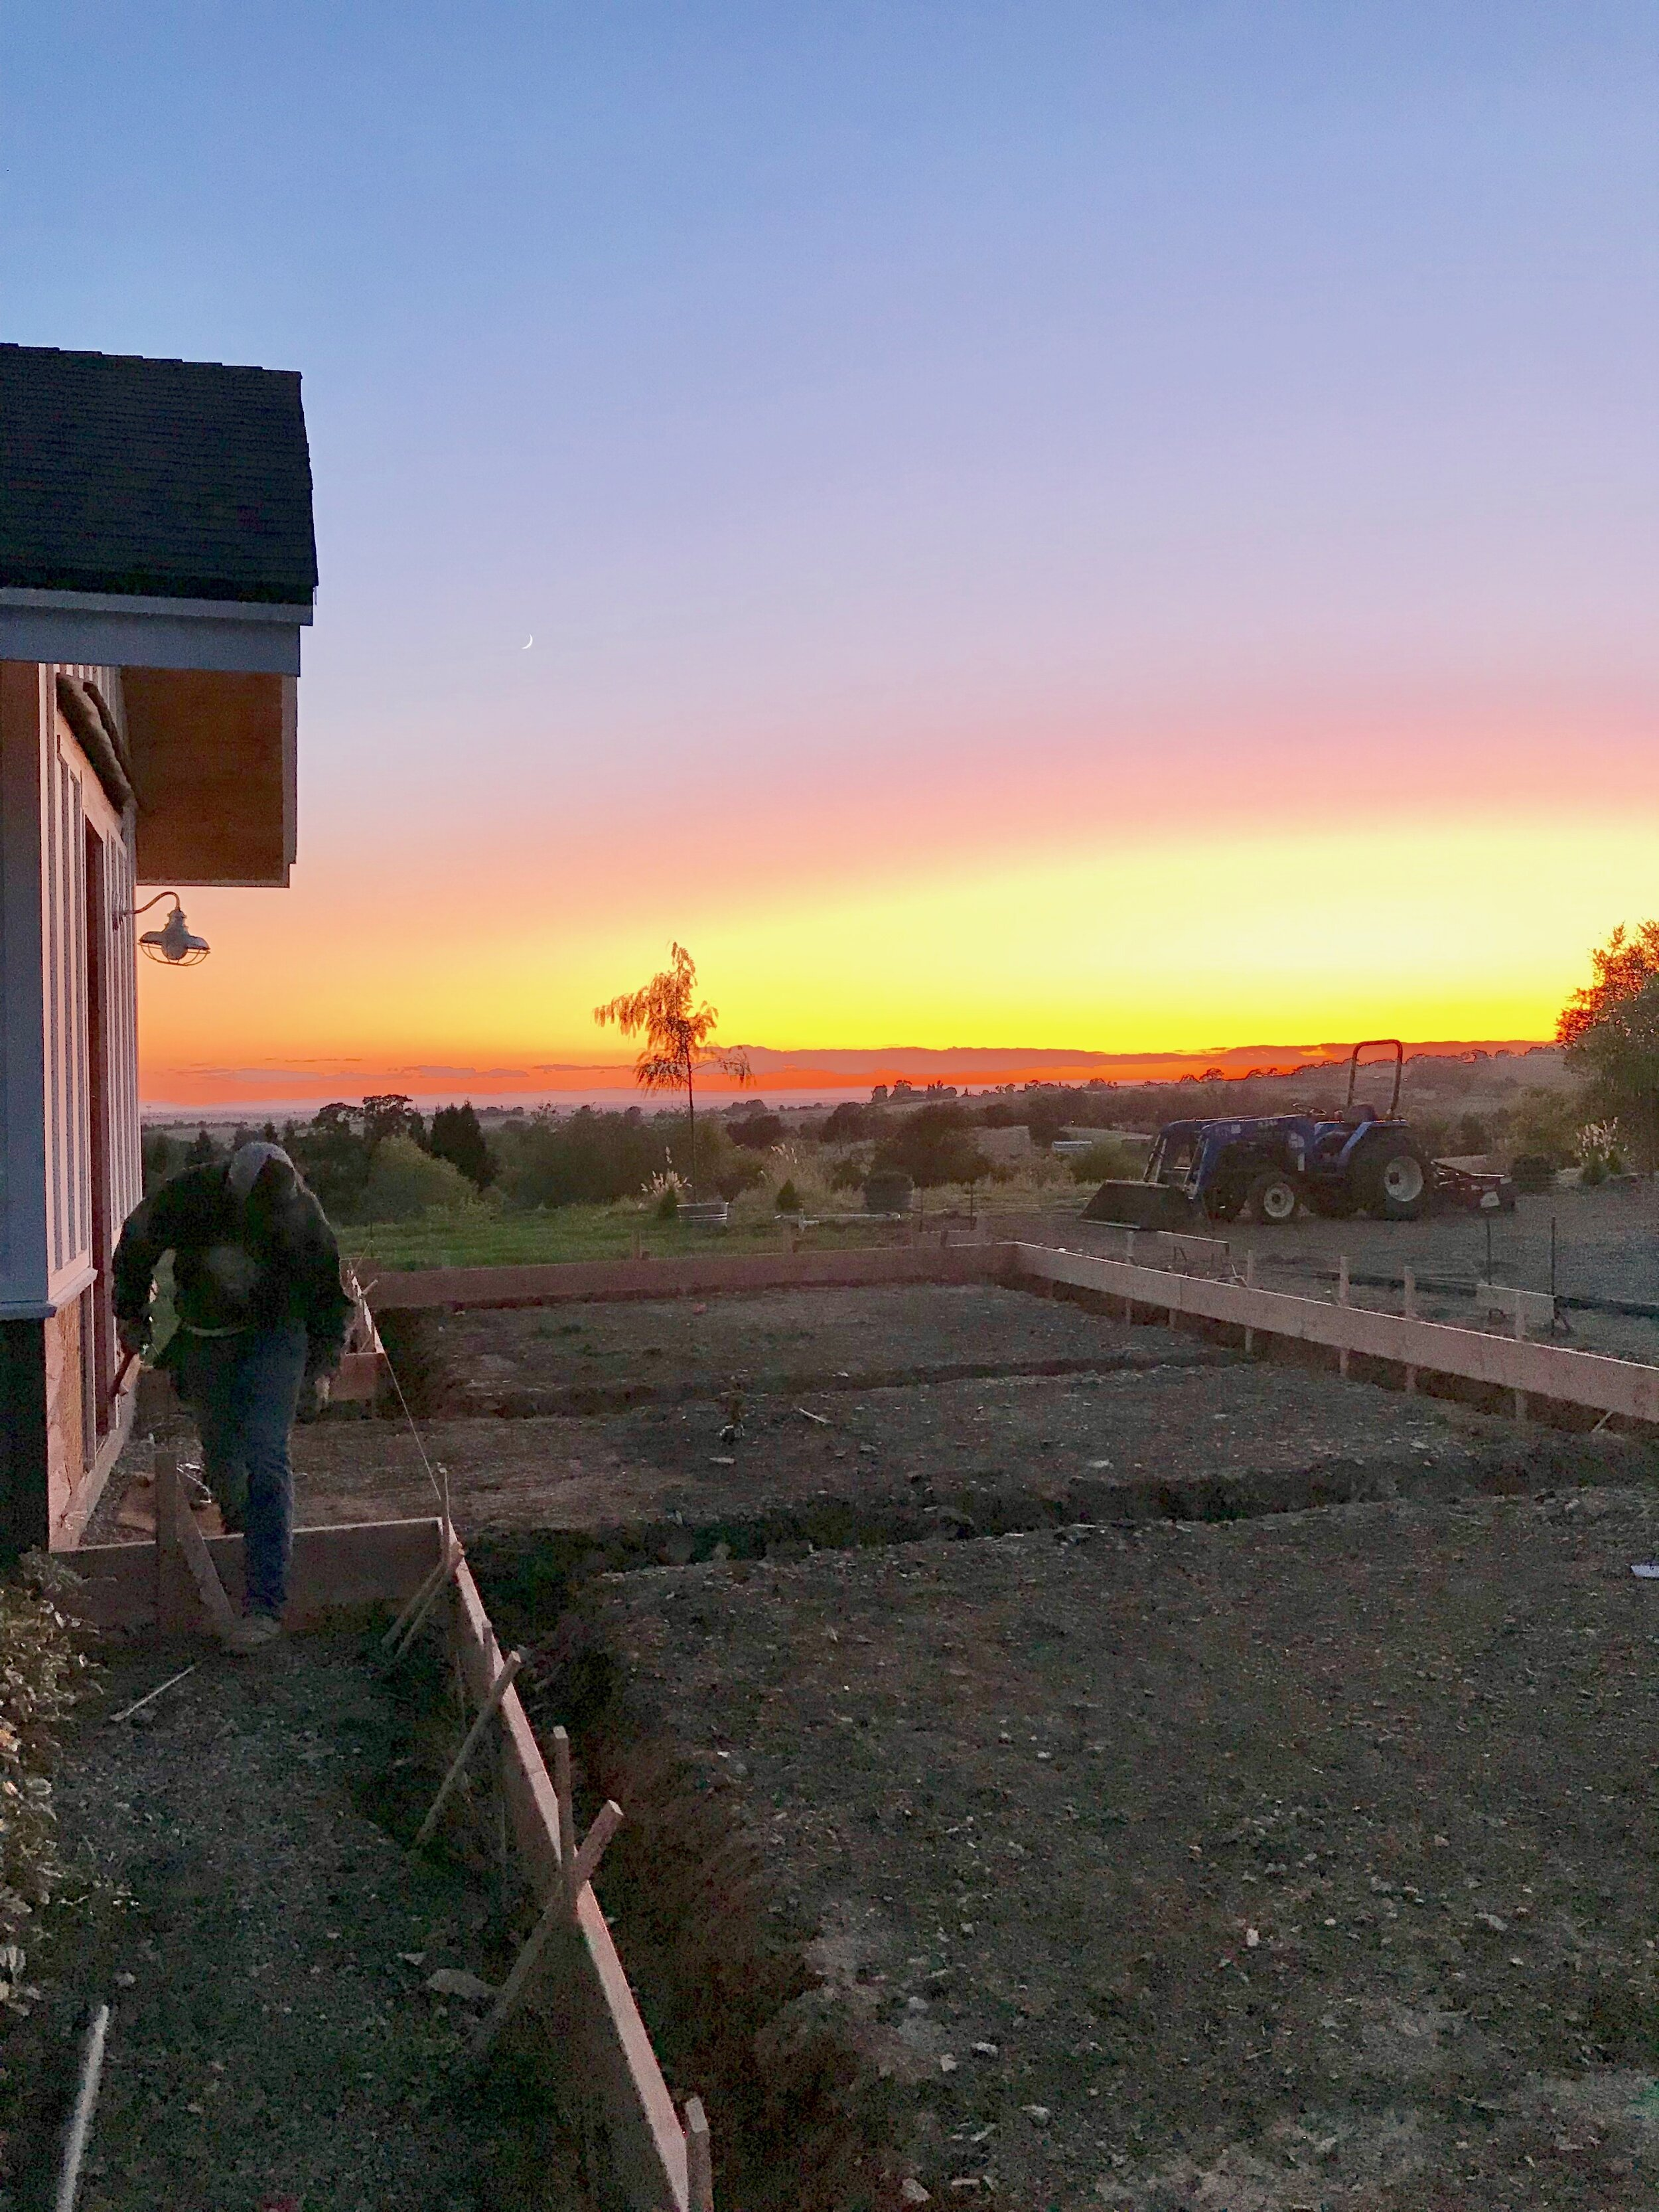 Home Building #farmhouse, #modernhouse, #diy, #diyconstruction, #homesteading, #homeviews, #whitefarmhouse, #farmhouselove, #fixerupper, #diy #diyhomeprojects, #diyhomedecor, #diyfarmhouse #homebuild, #homebuilder, #farmhouseview #farmhousegoals #homebuilding, #construction, #modernfarmhouse, #building, #dreamhome, #diyhome, #renovation, #concrete, #customhome, #architecturelovers, #homedepot, #homeimprovement, #instahome, #dreamhome #concrete, formboards, #concreteprep, #diyconscrete